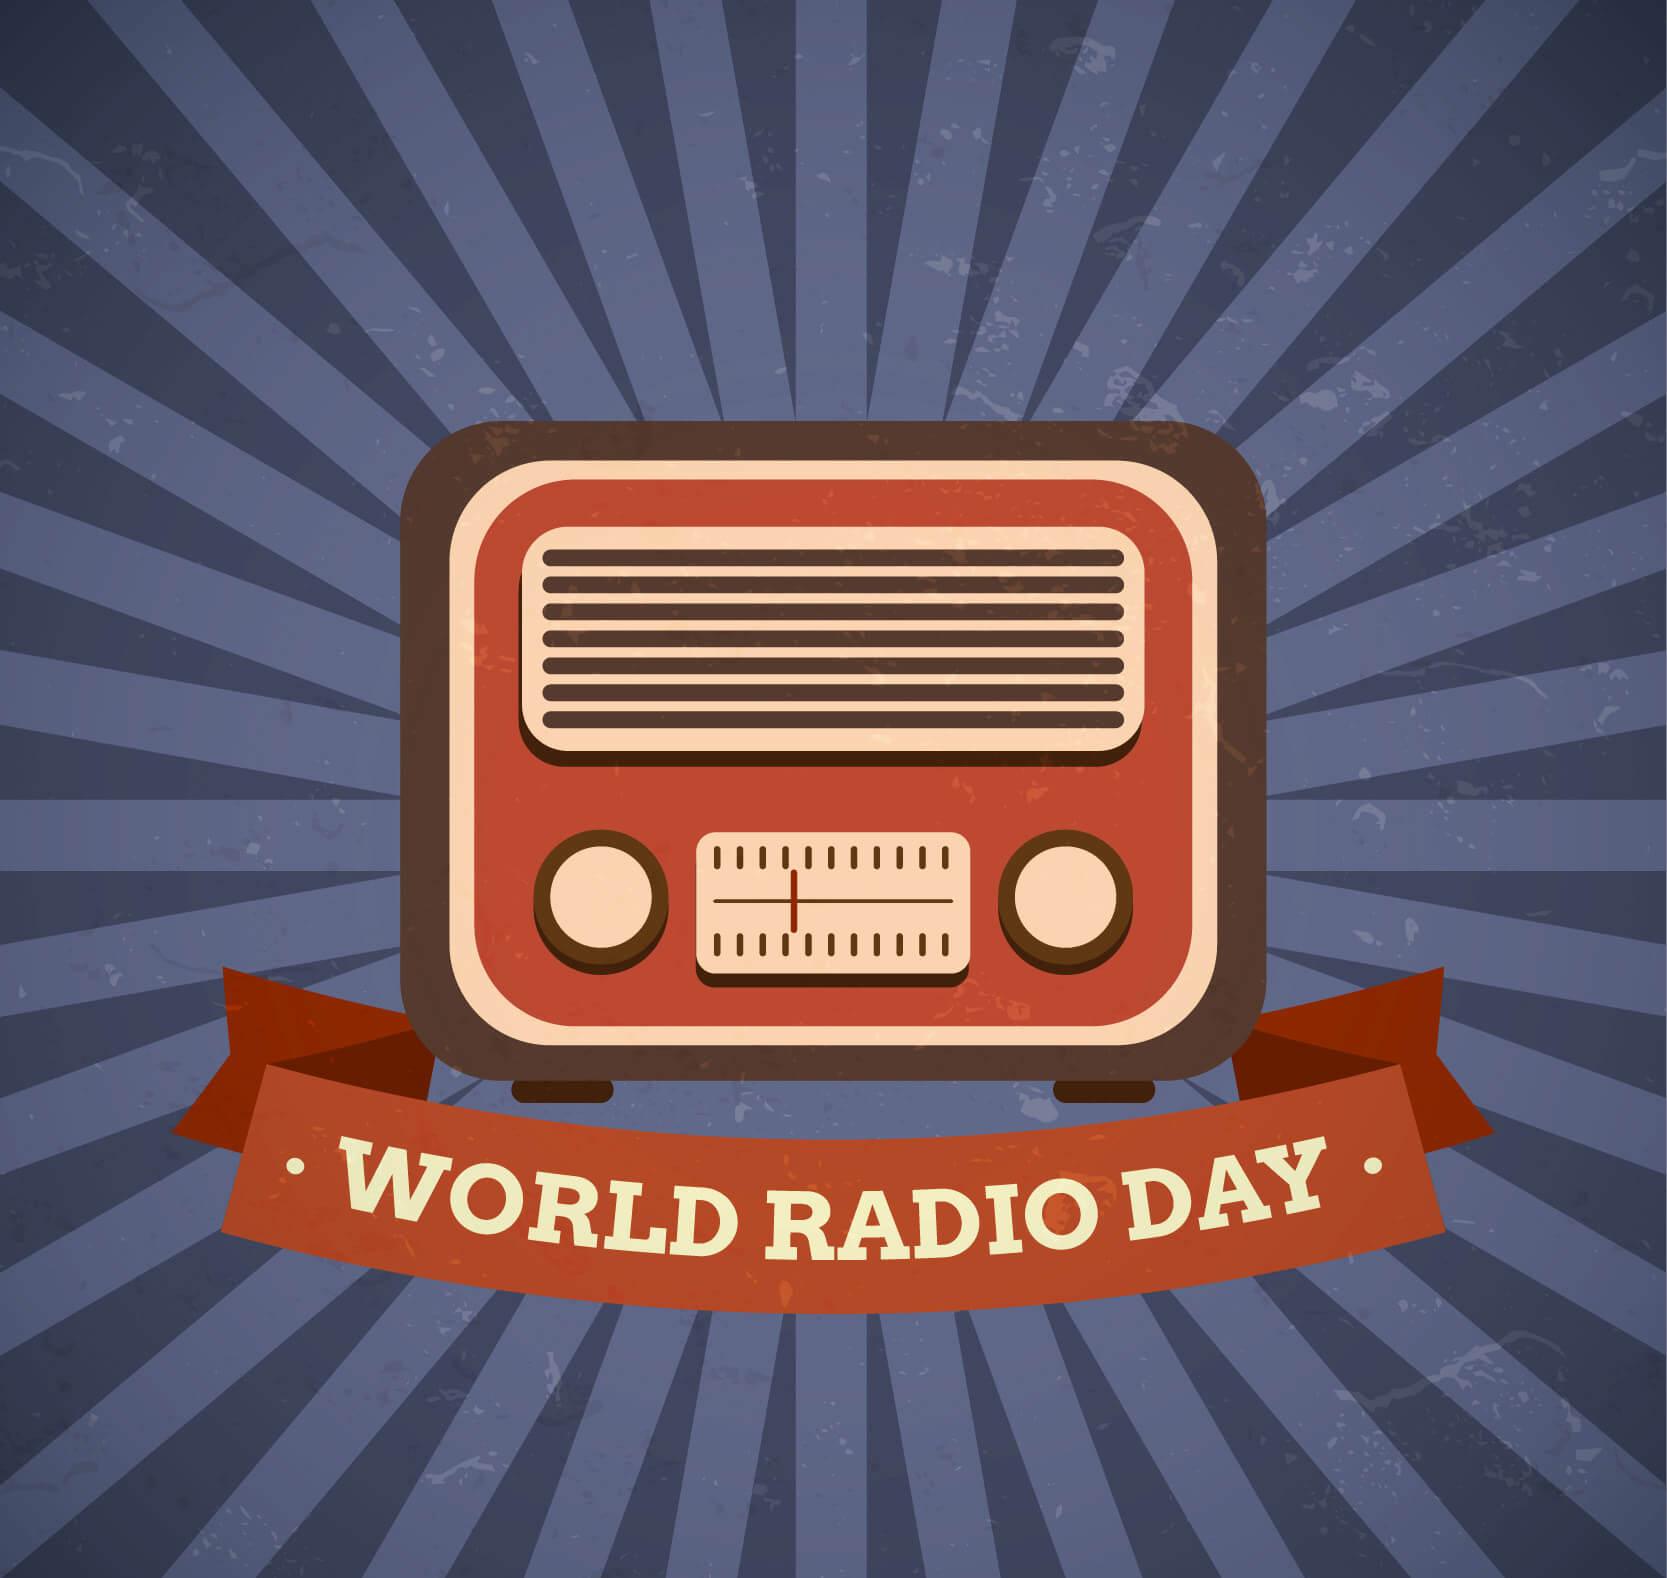 world radio day desktop background hd wallpaper